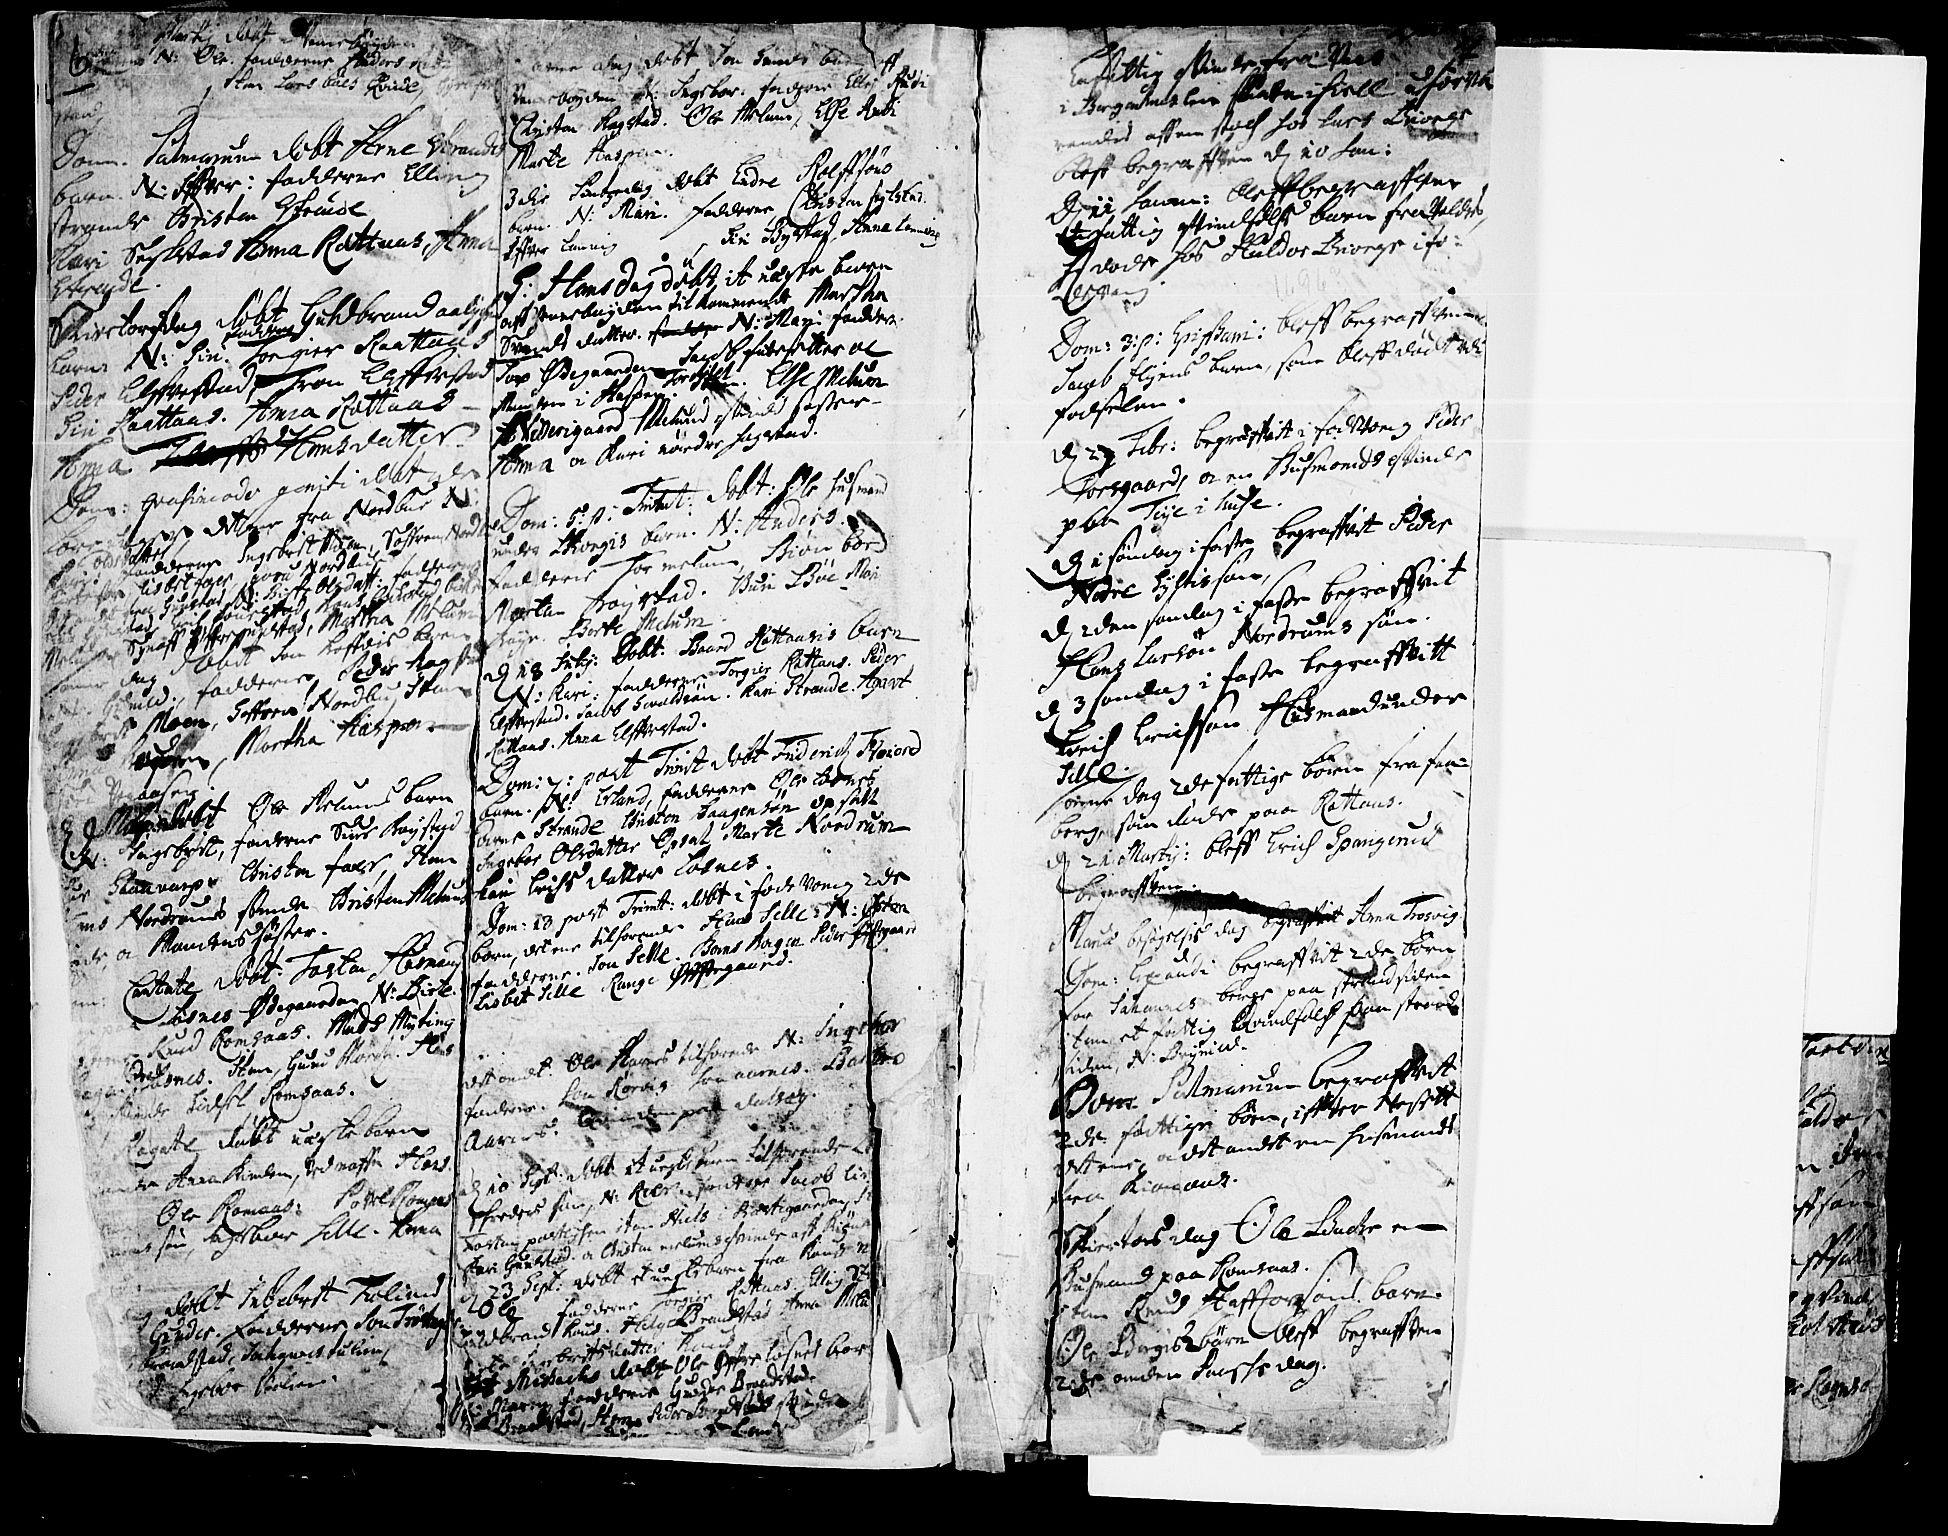 SAH, Ringebu prestekontor, Ministerialbok nr. 1, 1696-1733, s. 6-7